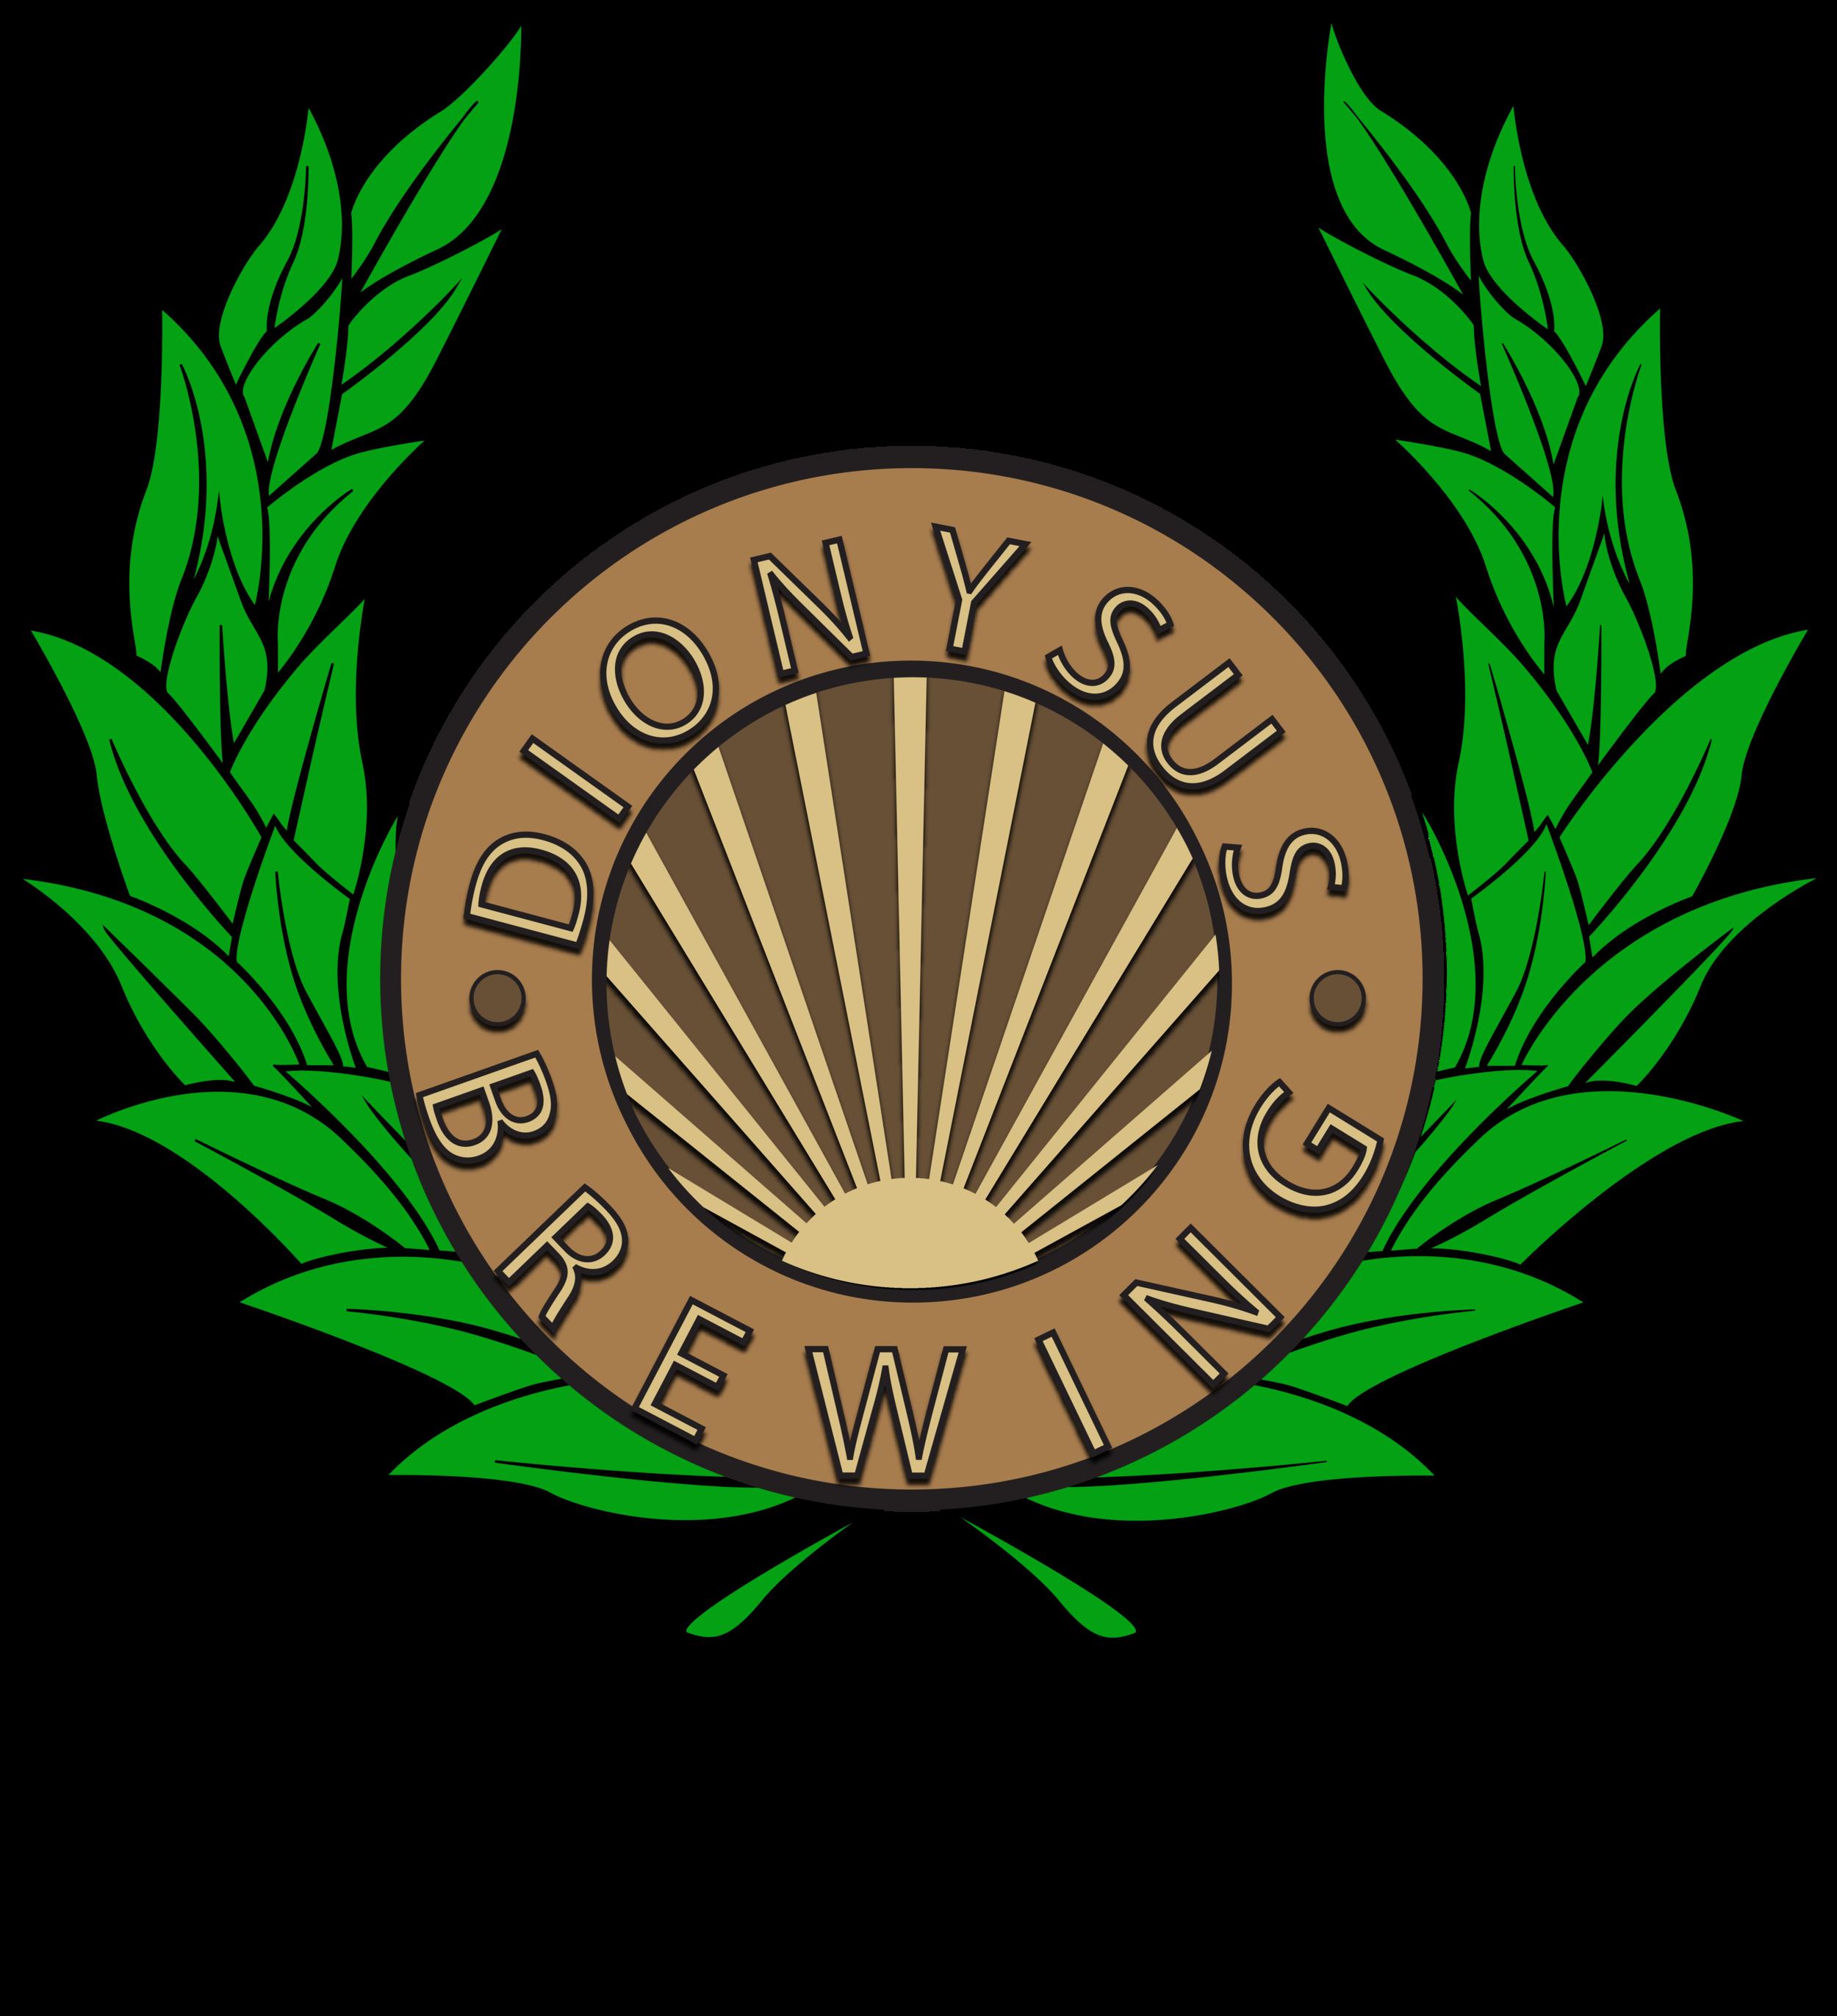 DionysusBrewing_Logo2.png